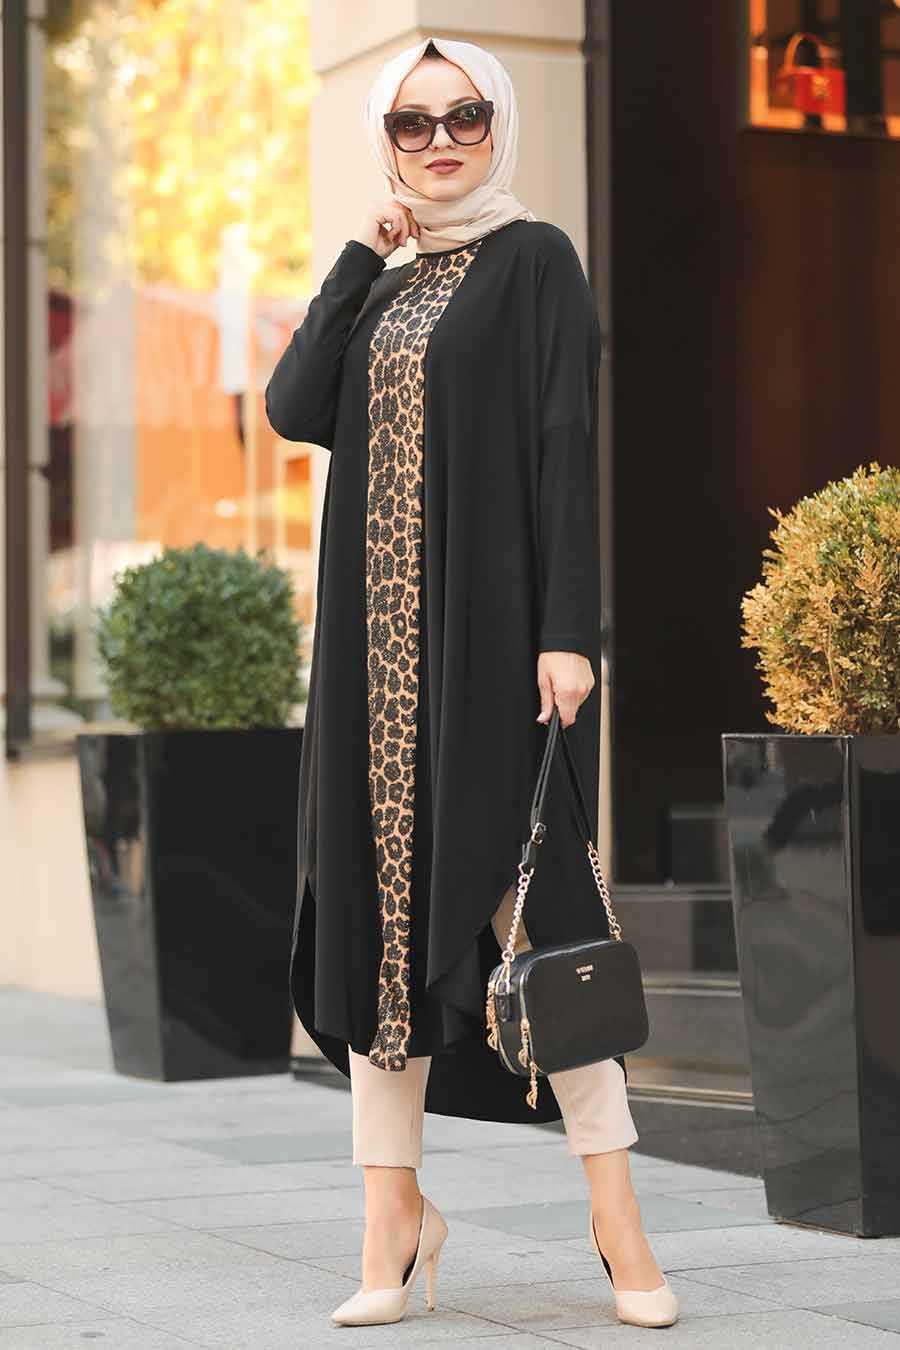 Leopard Patterned Black Hijab Tunic 4846S